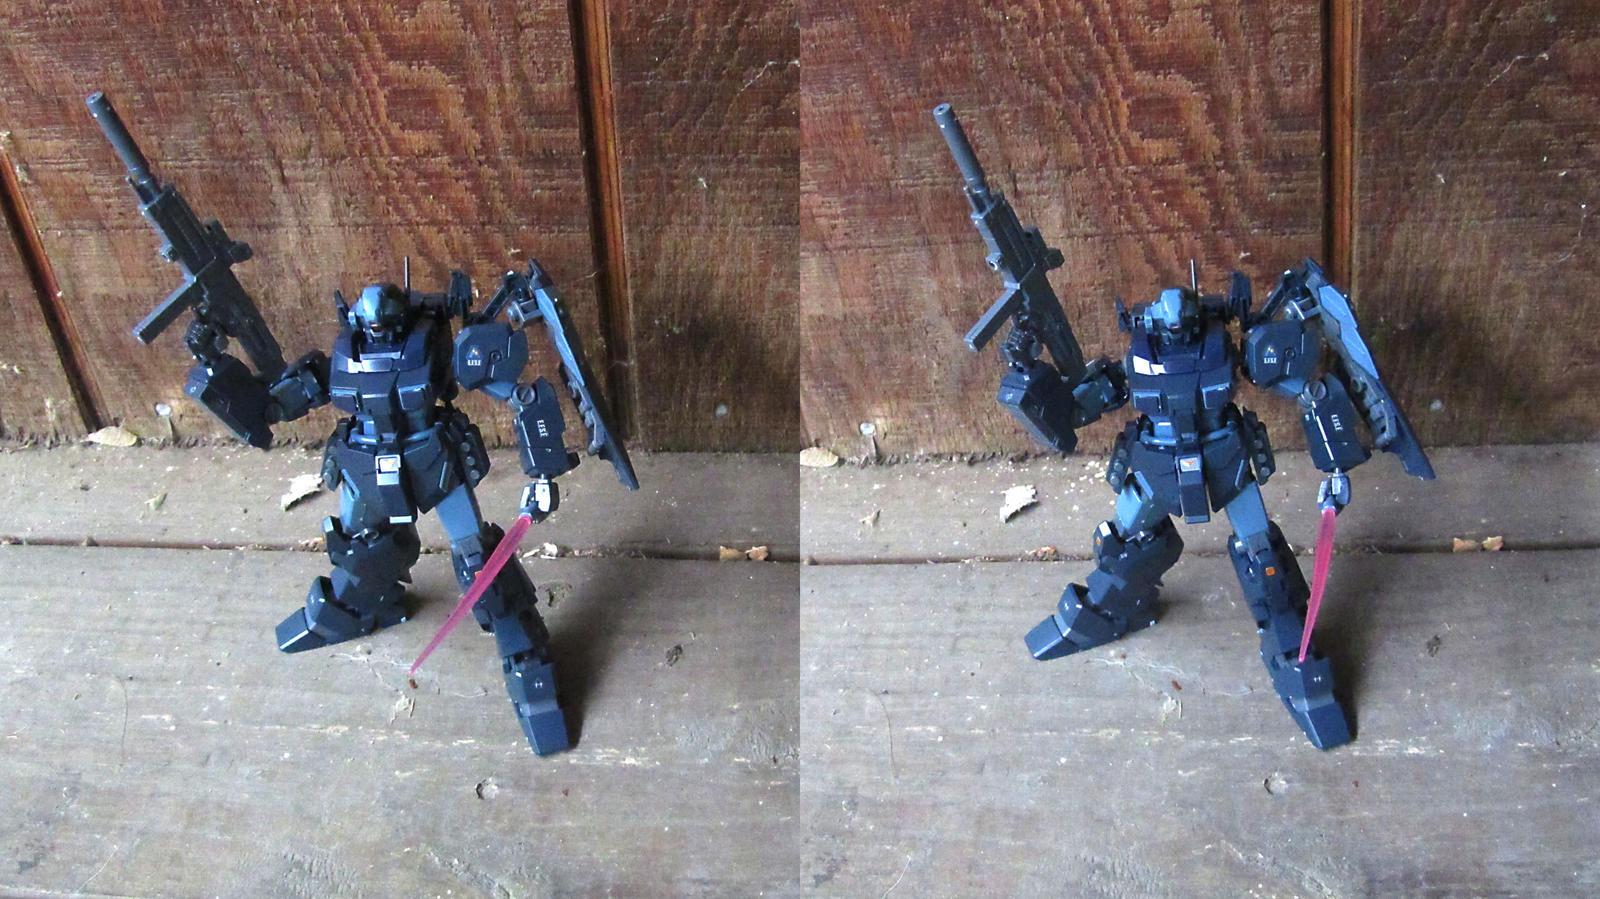 Stereograph - Gundam by alanbecker